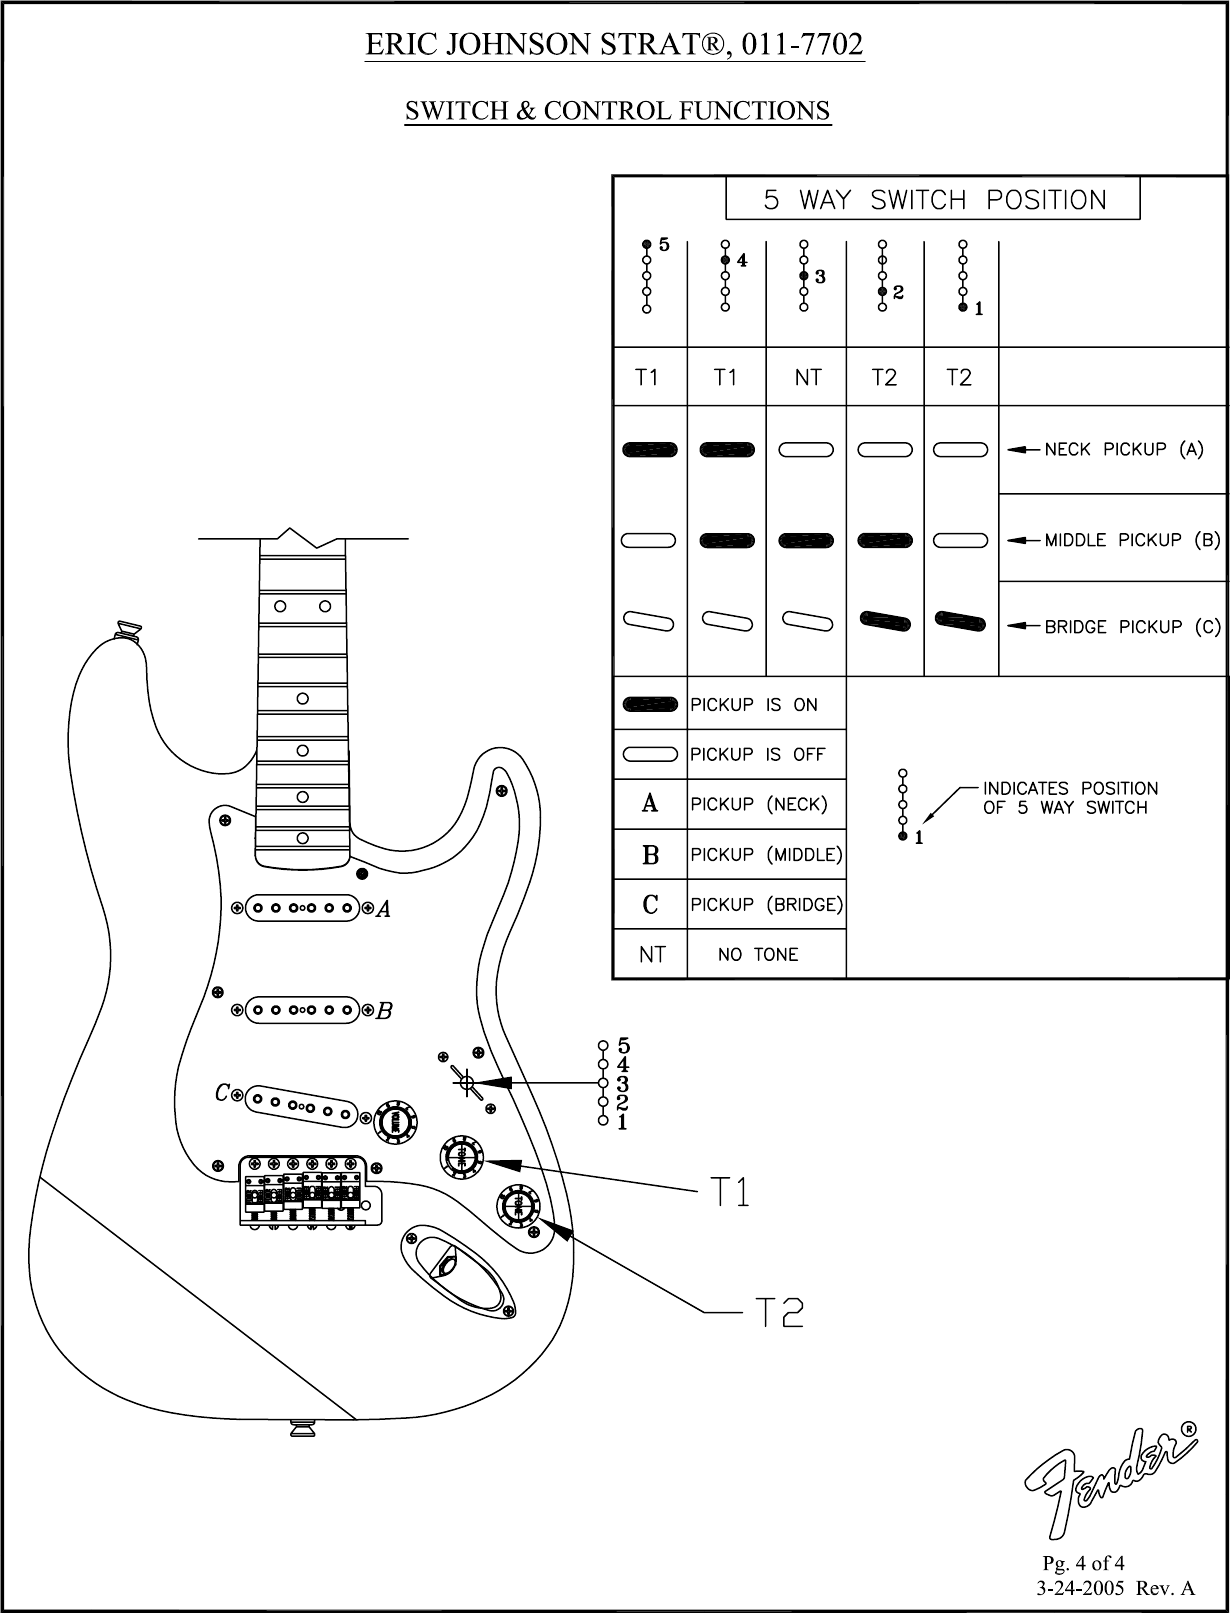 Page 4 of 4 - Fender SD 011-7702 Eric Johnson Strat - Rev A  011-7702A SISD